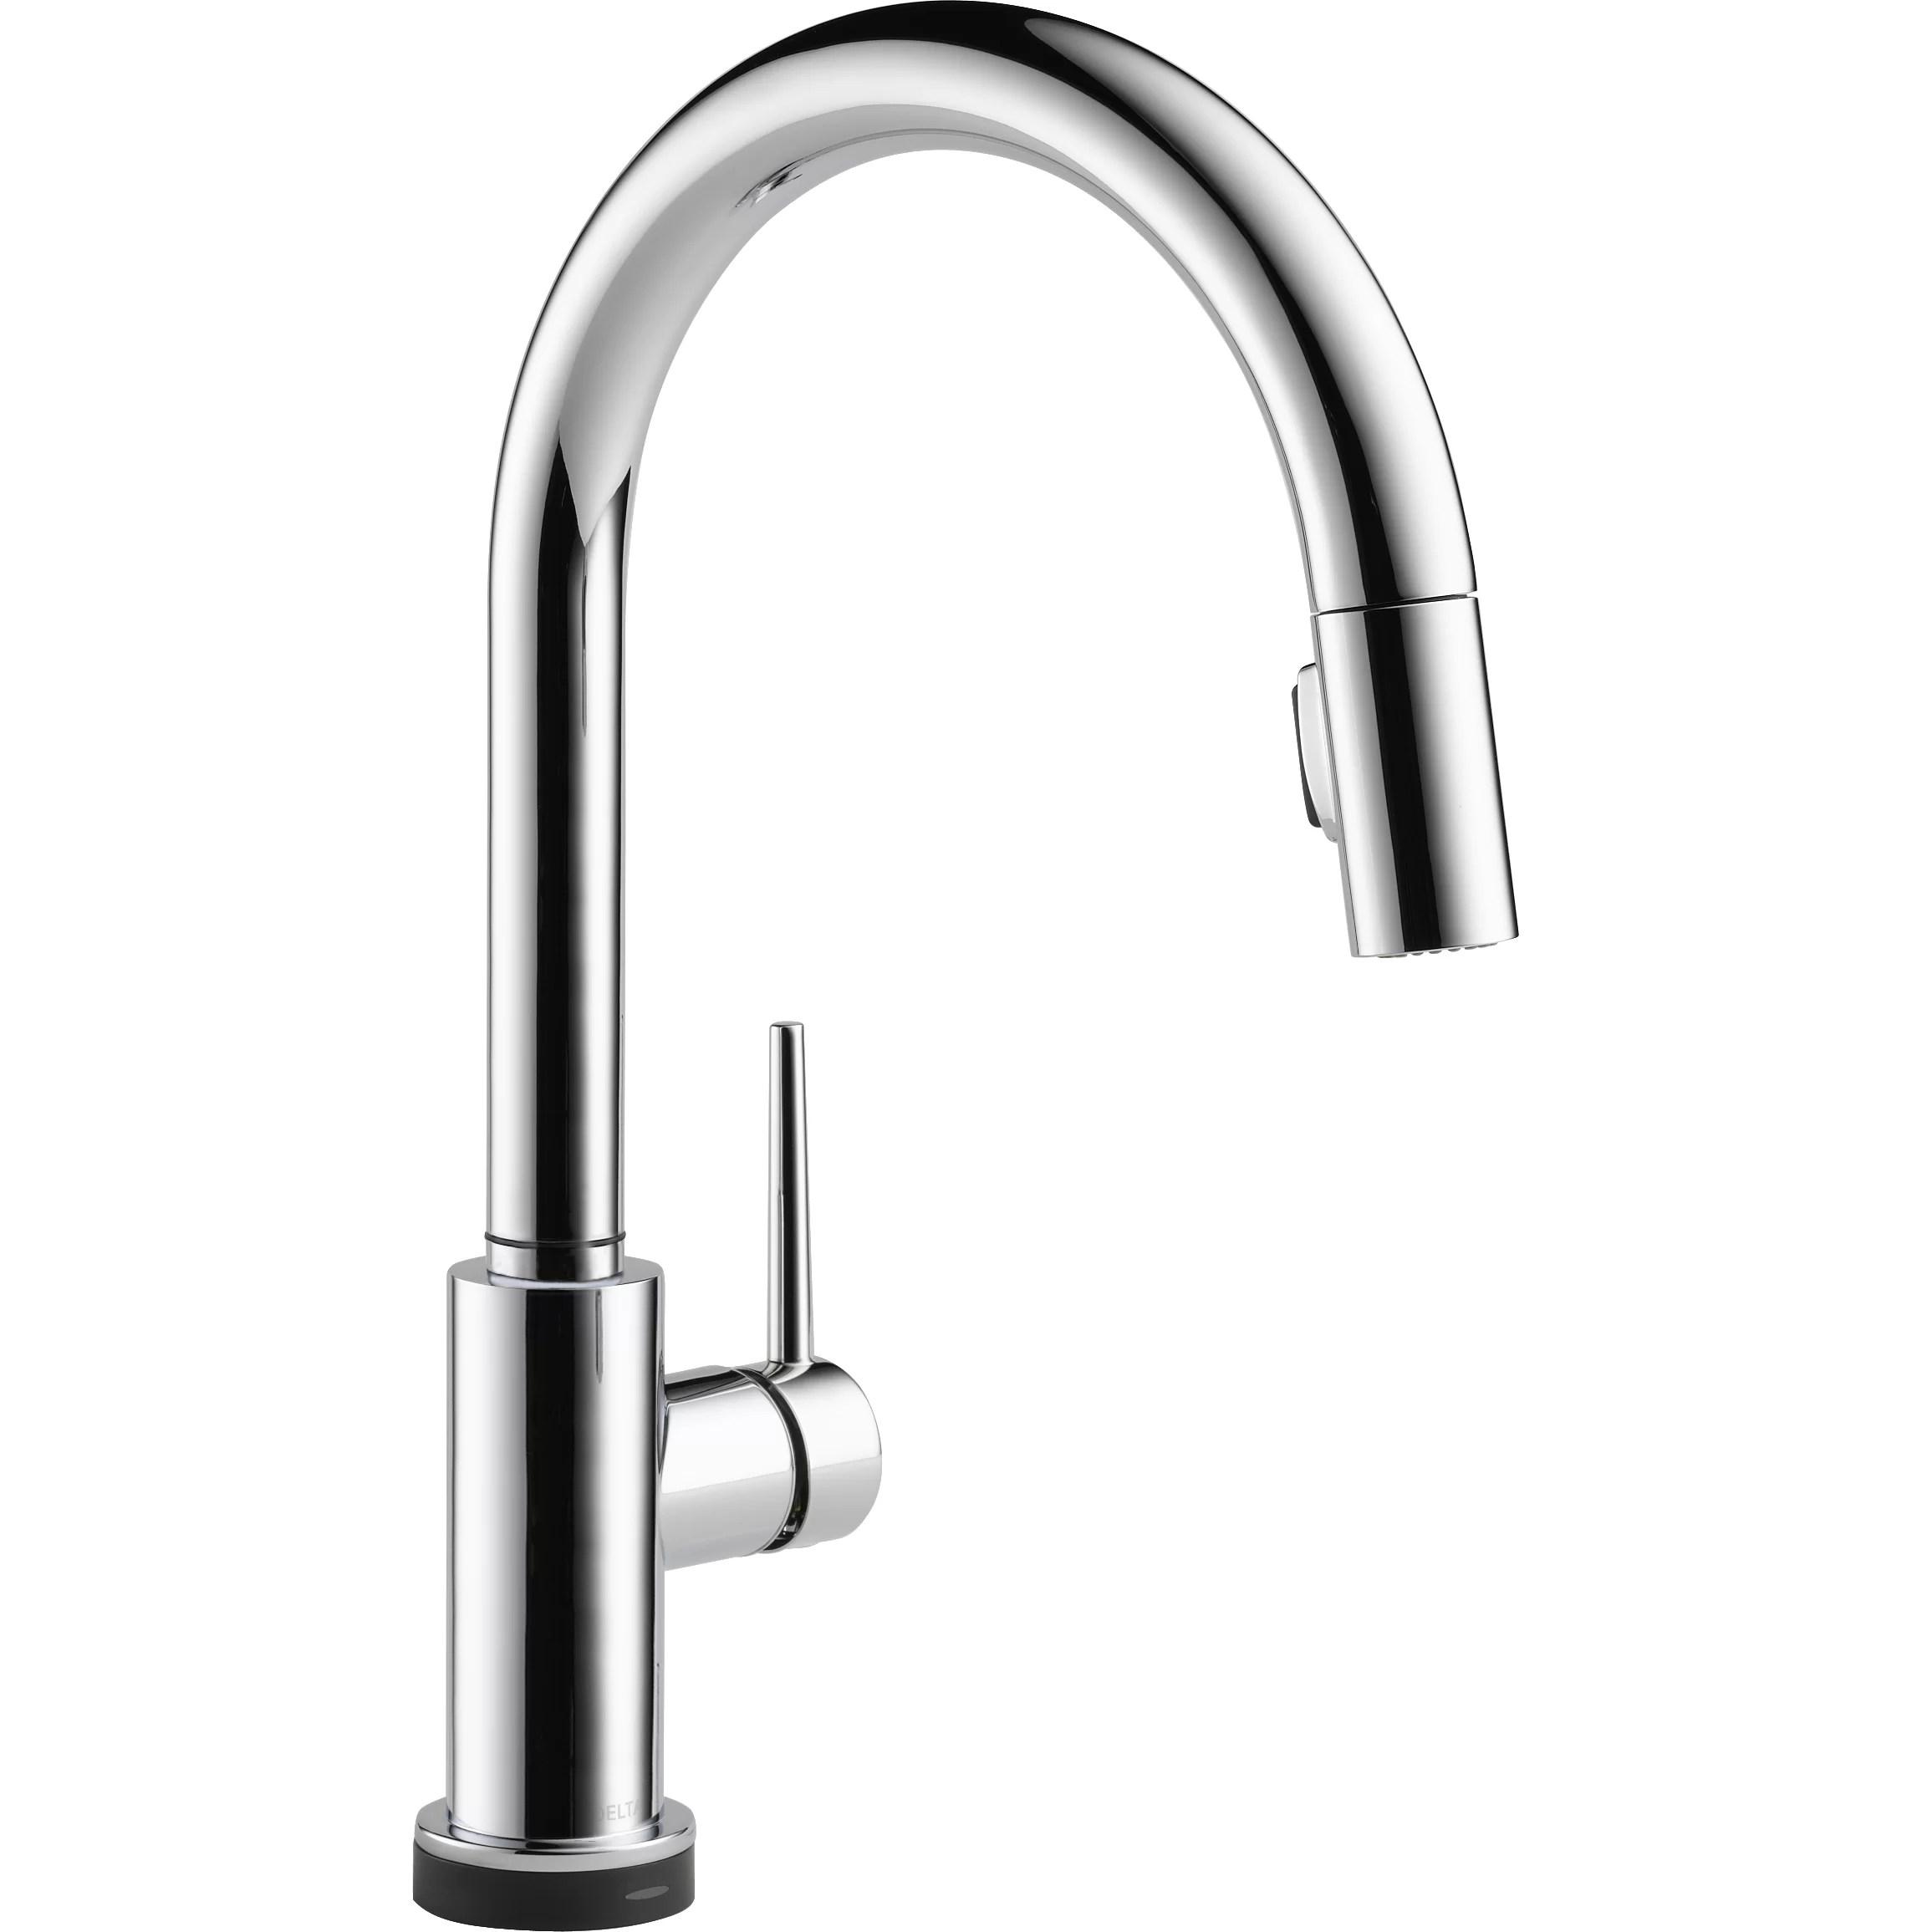 gooseneck kitchen faucets delta cassidy kitchen faucet Gooseneck Kitchen Faucets